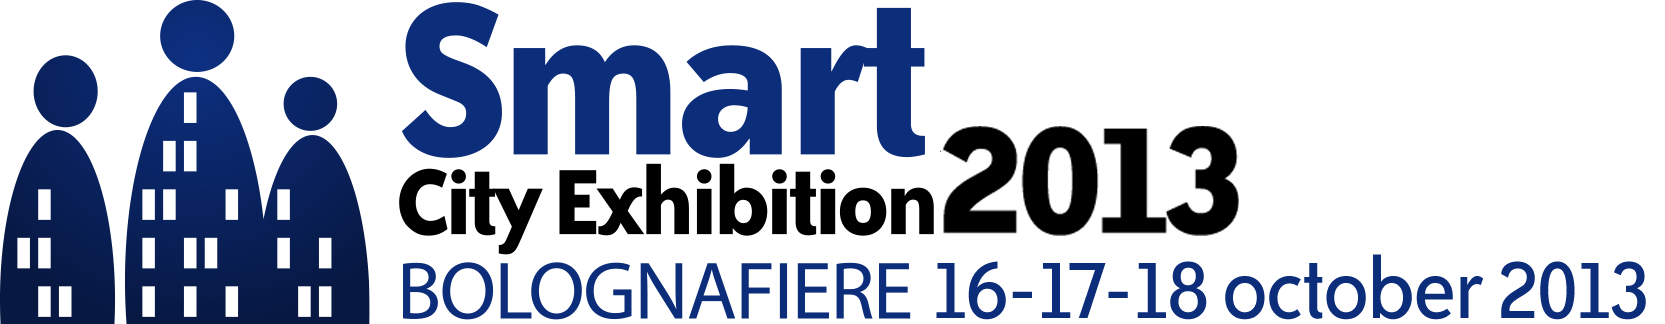 logo smart city exhibition 2013